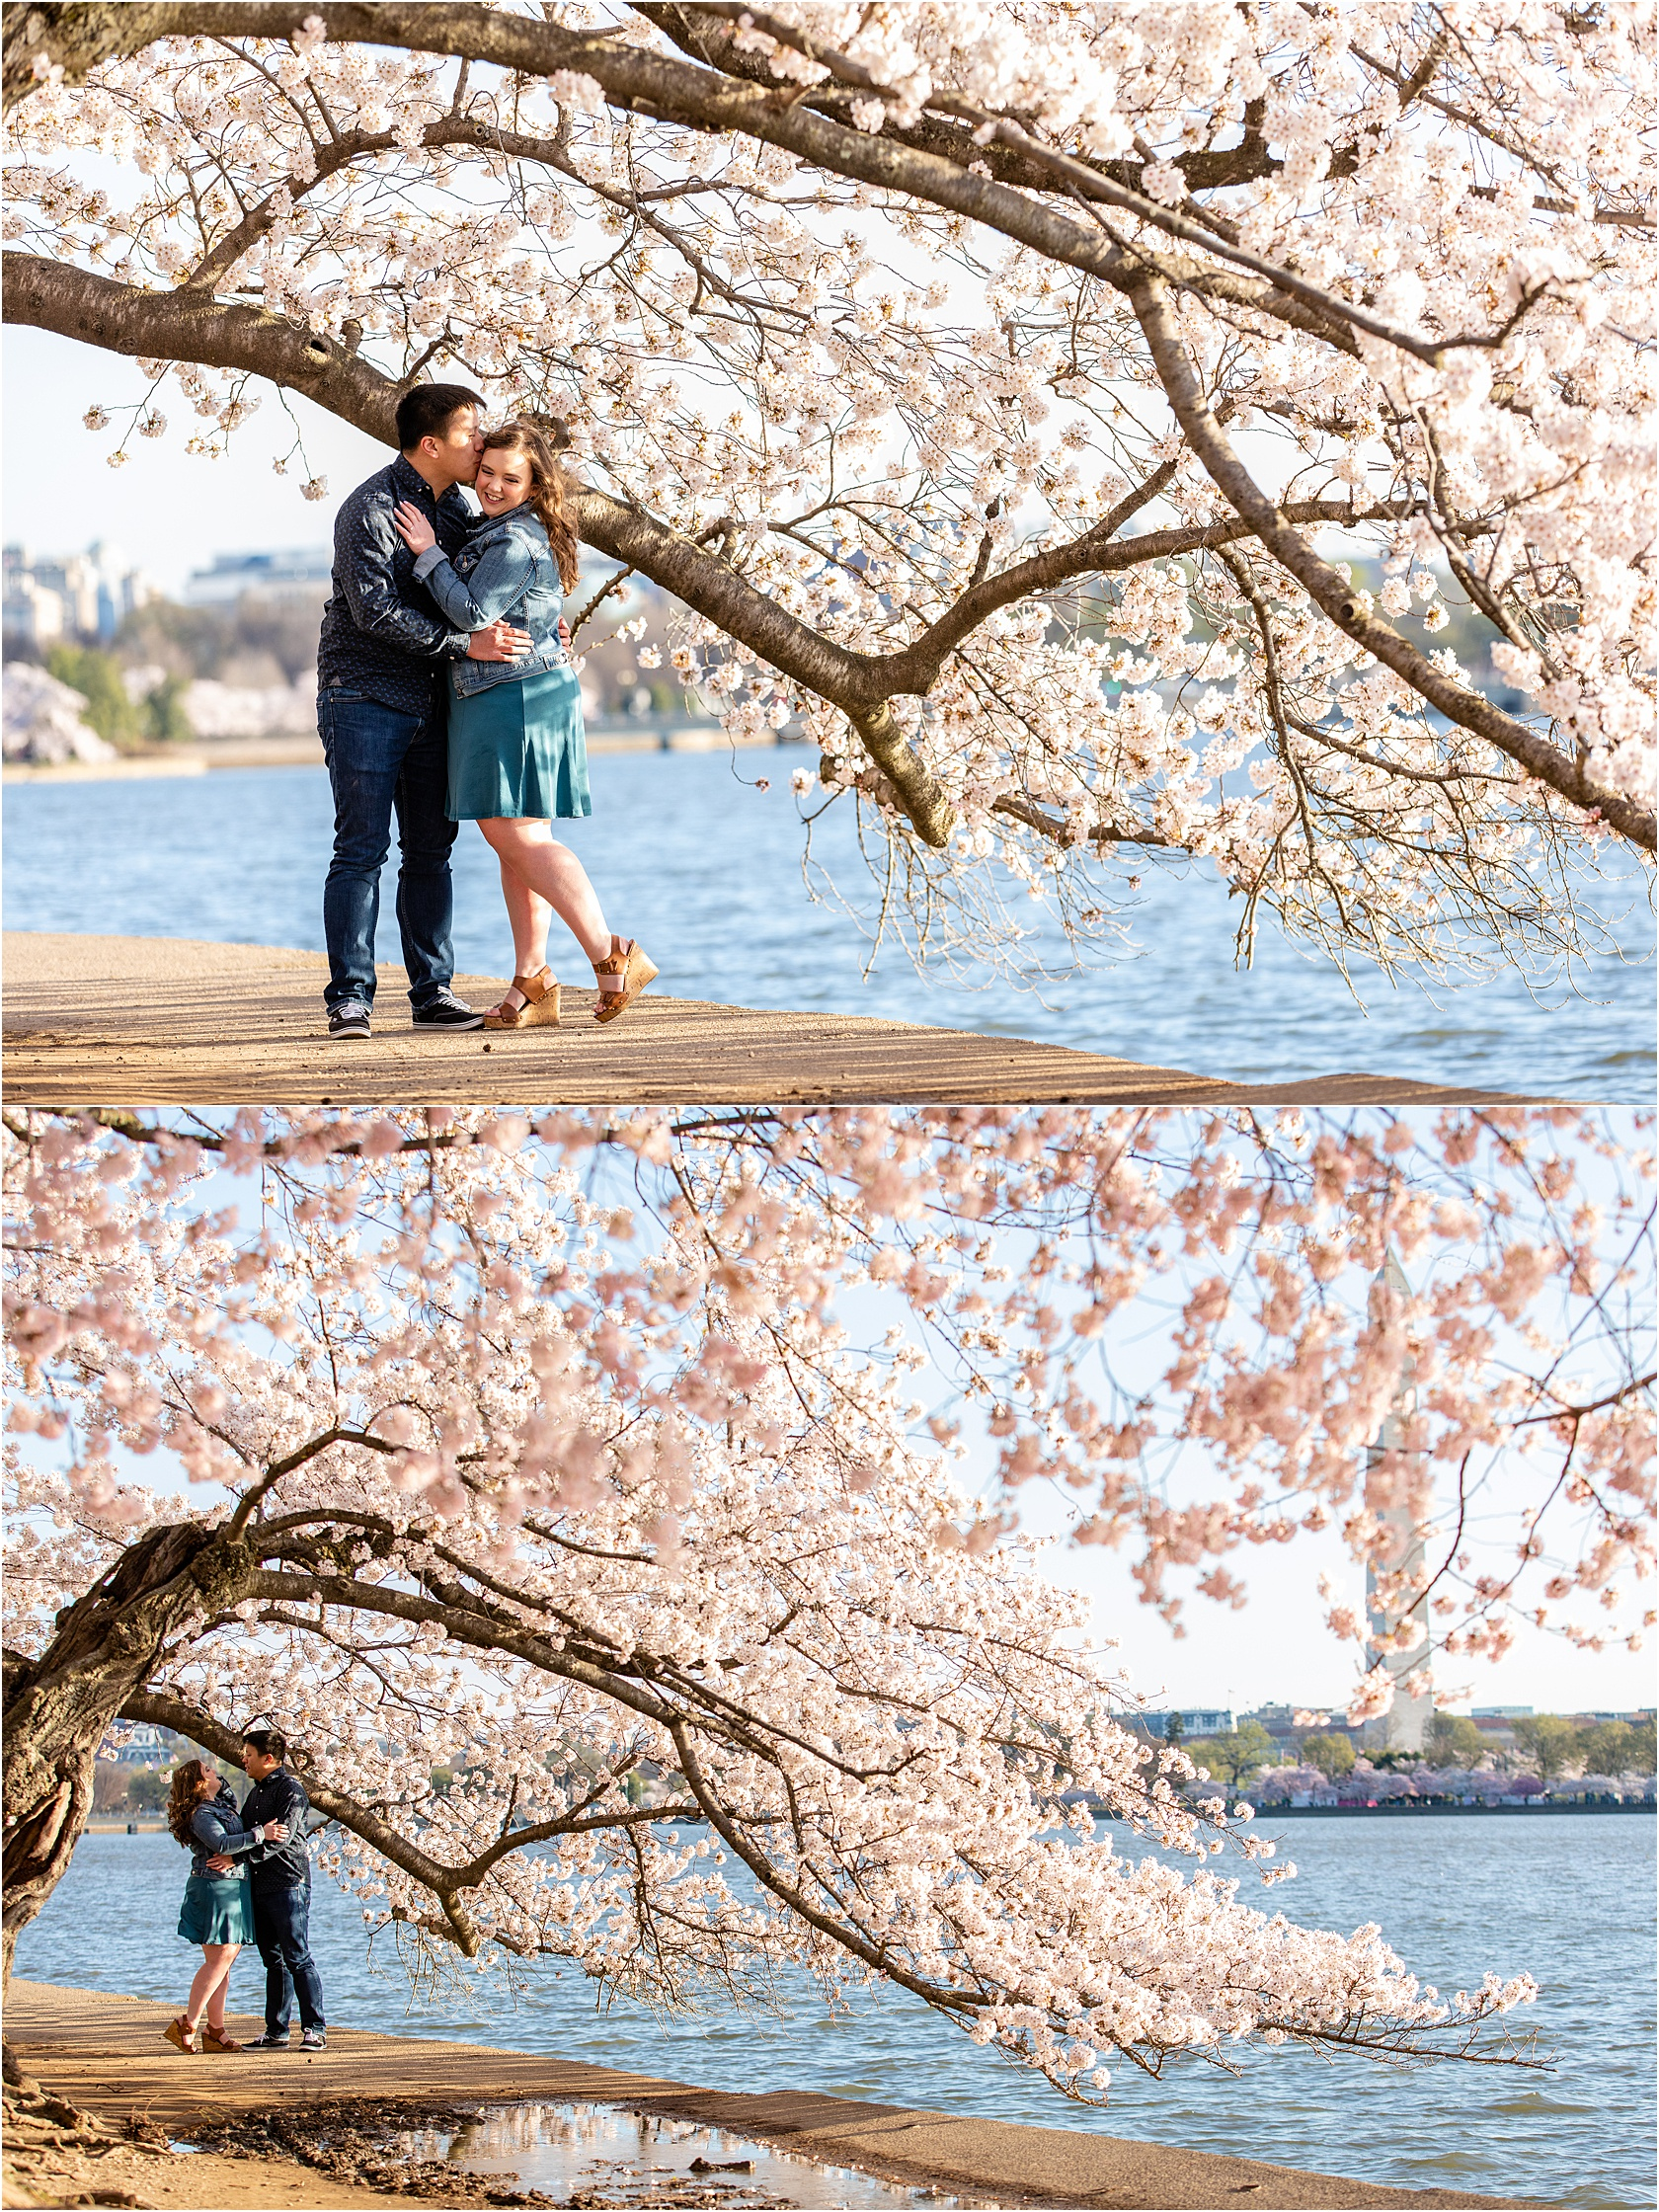 MelissaKevinCherryBlossomsDCEngagementSessionMarch2019LivingRadiantPhotographyphotos_0016.jpg